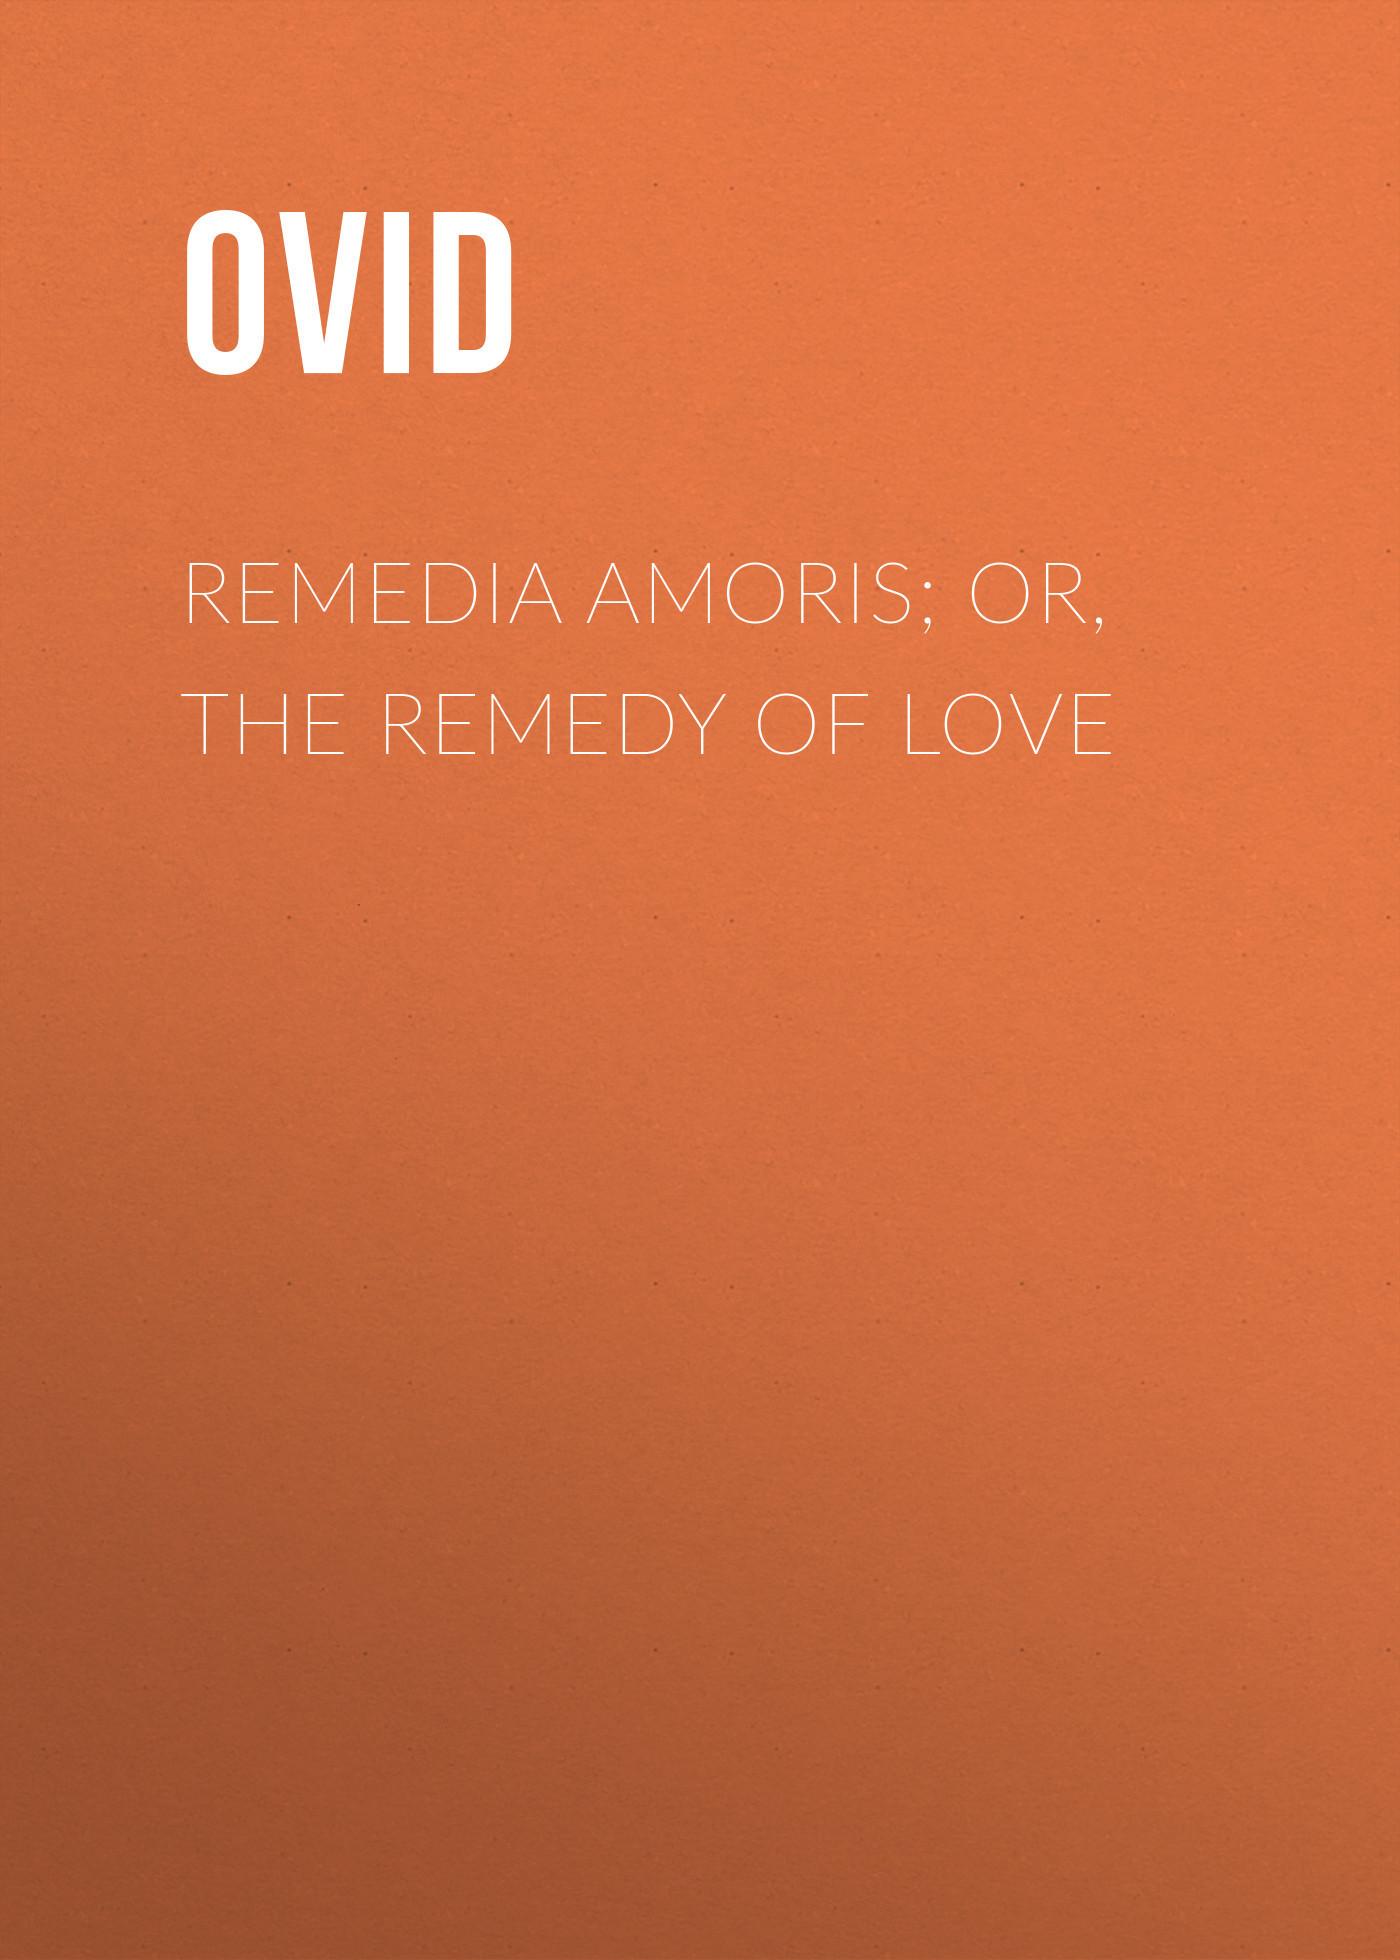 Ovid Remedia Amoris; or, The Remedy of Love godhuma patra swarasa a complimentary remedy for madhumeha